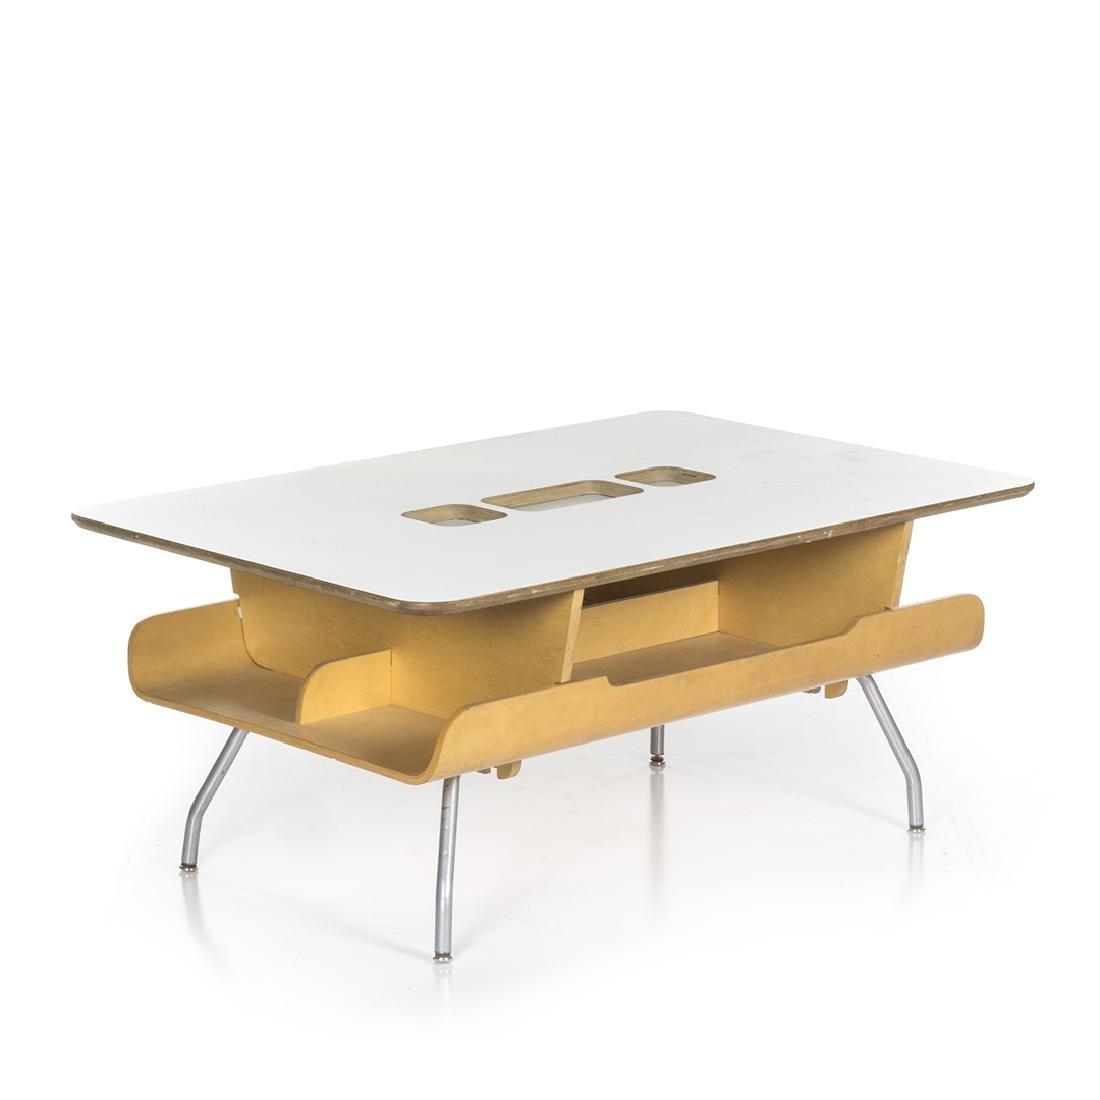 Herman Miller Child's Work Table - 2